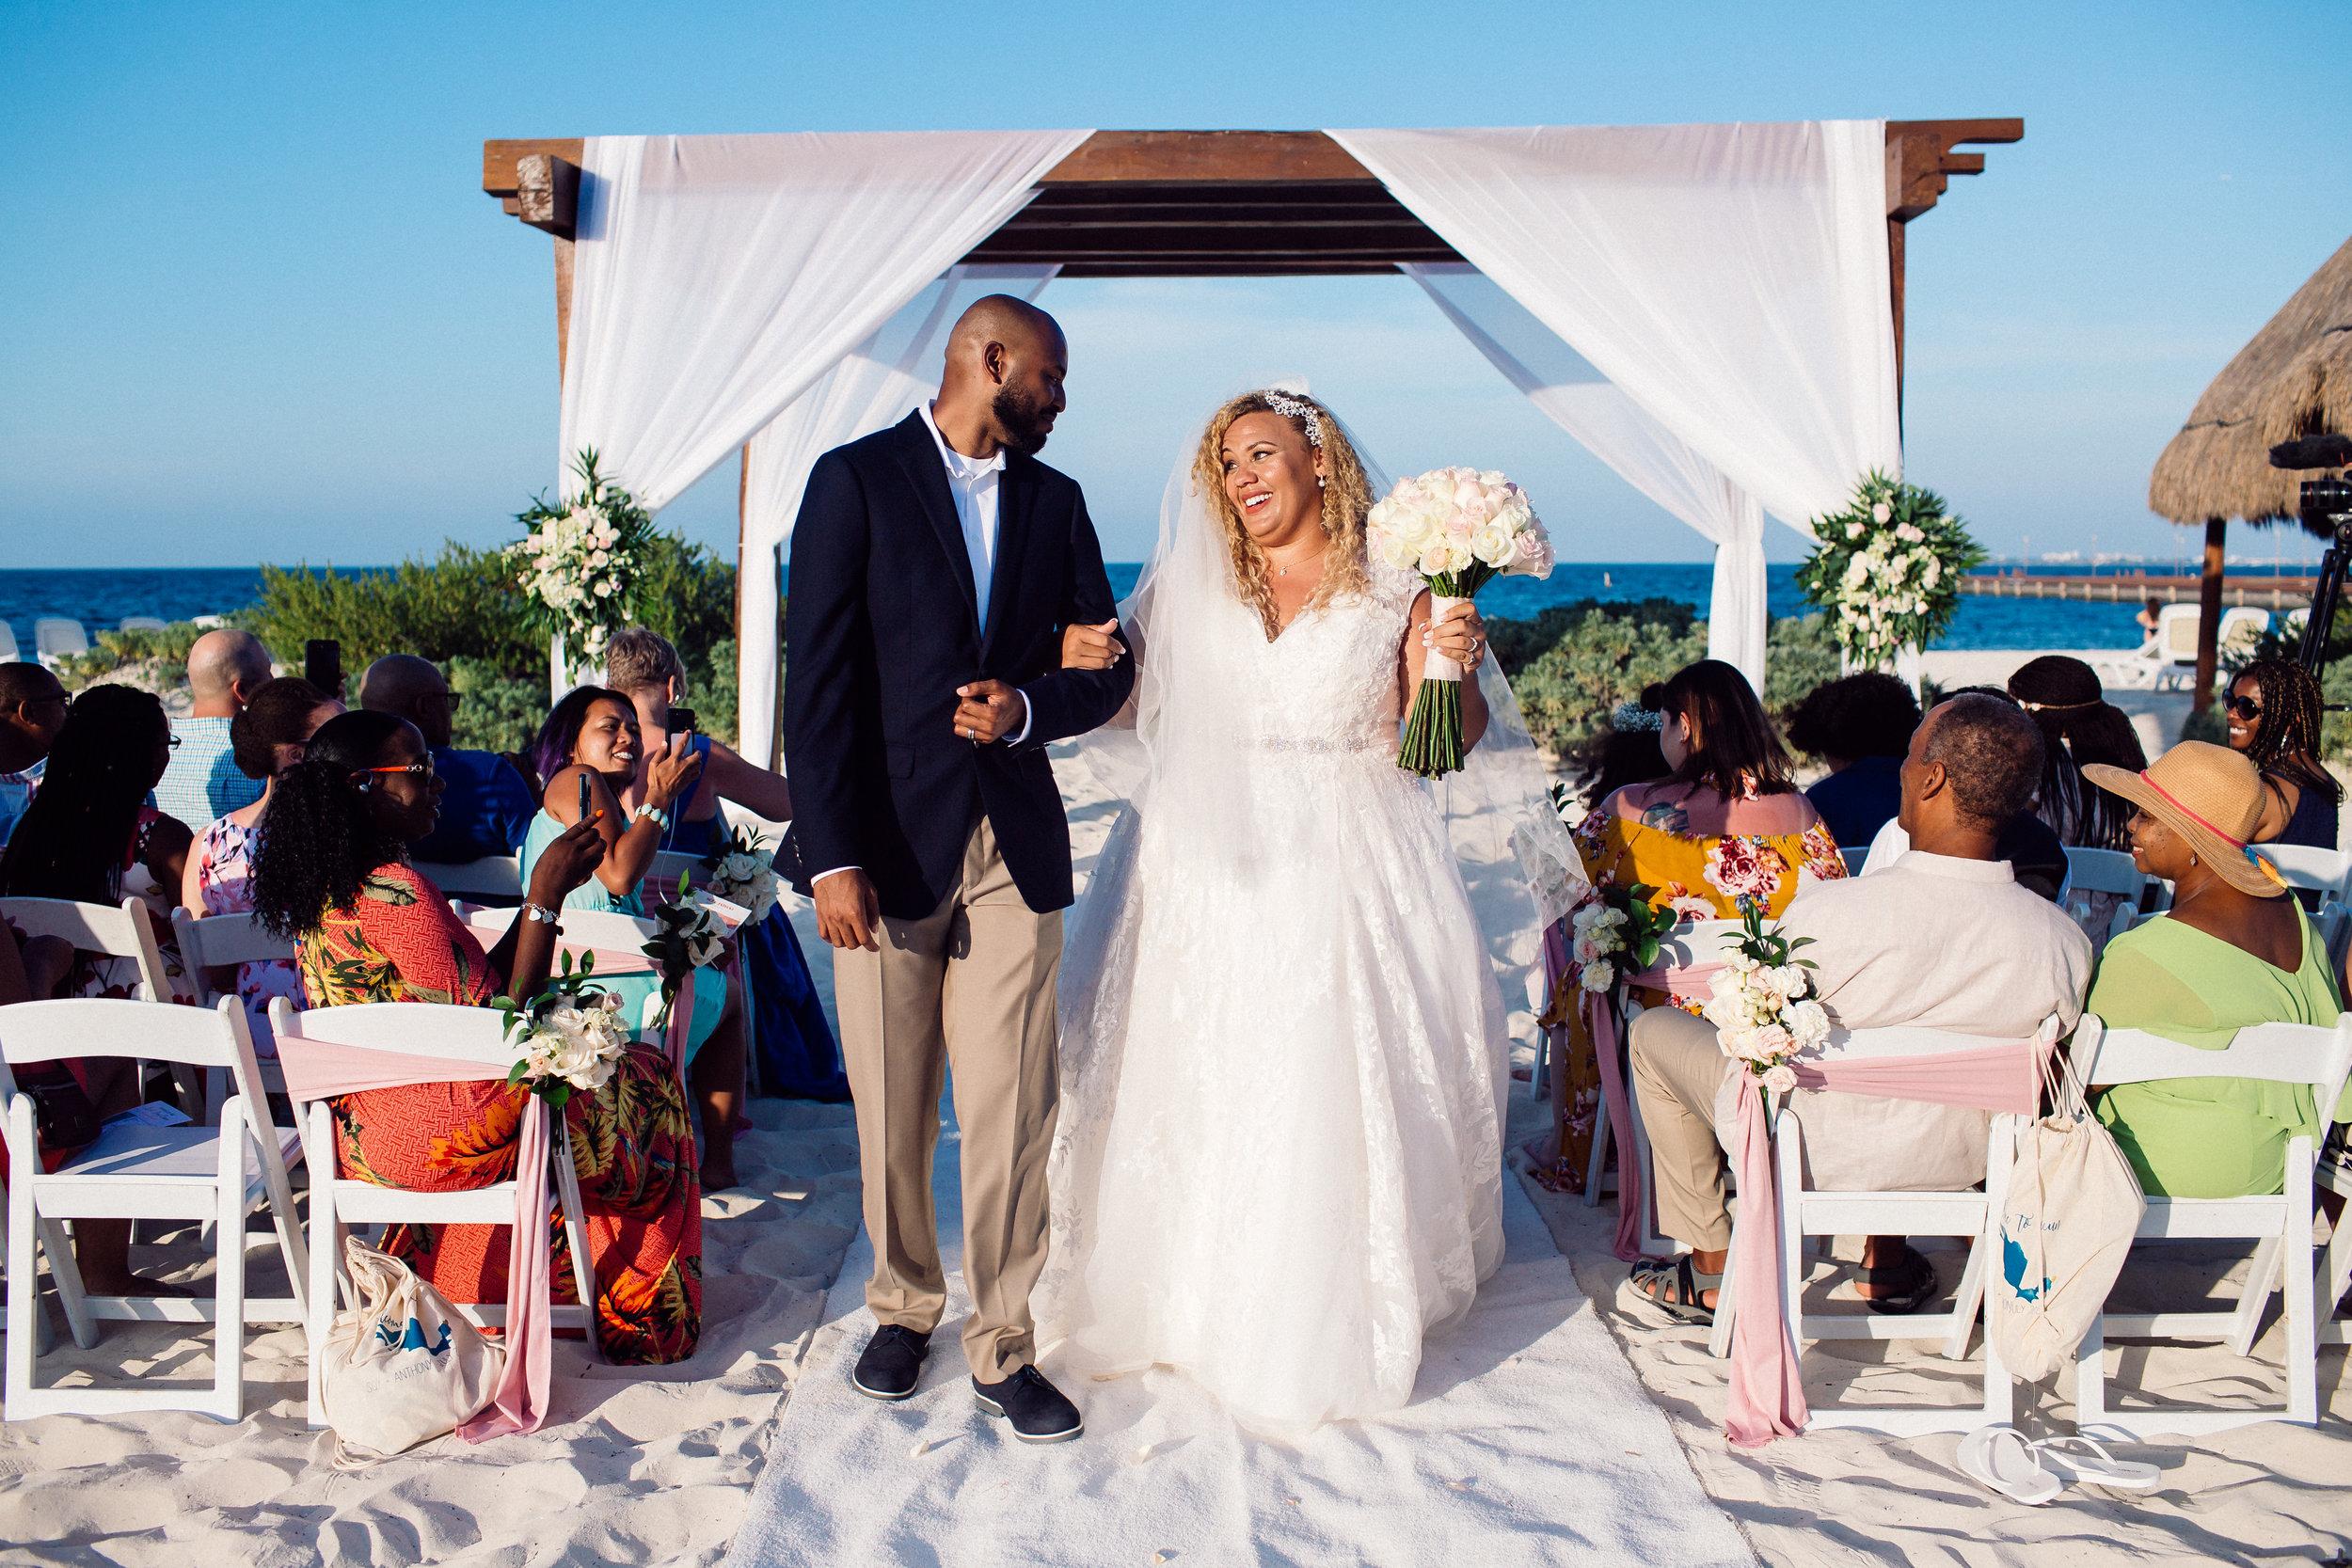 Beach_Destination_Wedding_Dreams_Playa_Mujeres_Sqy_Anthony_0126.jpg